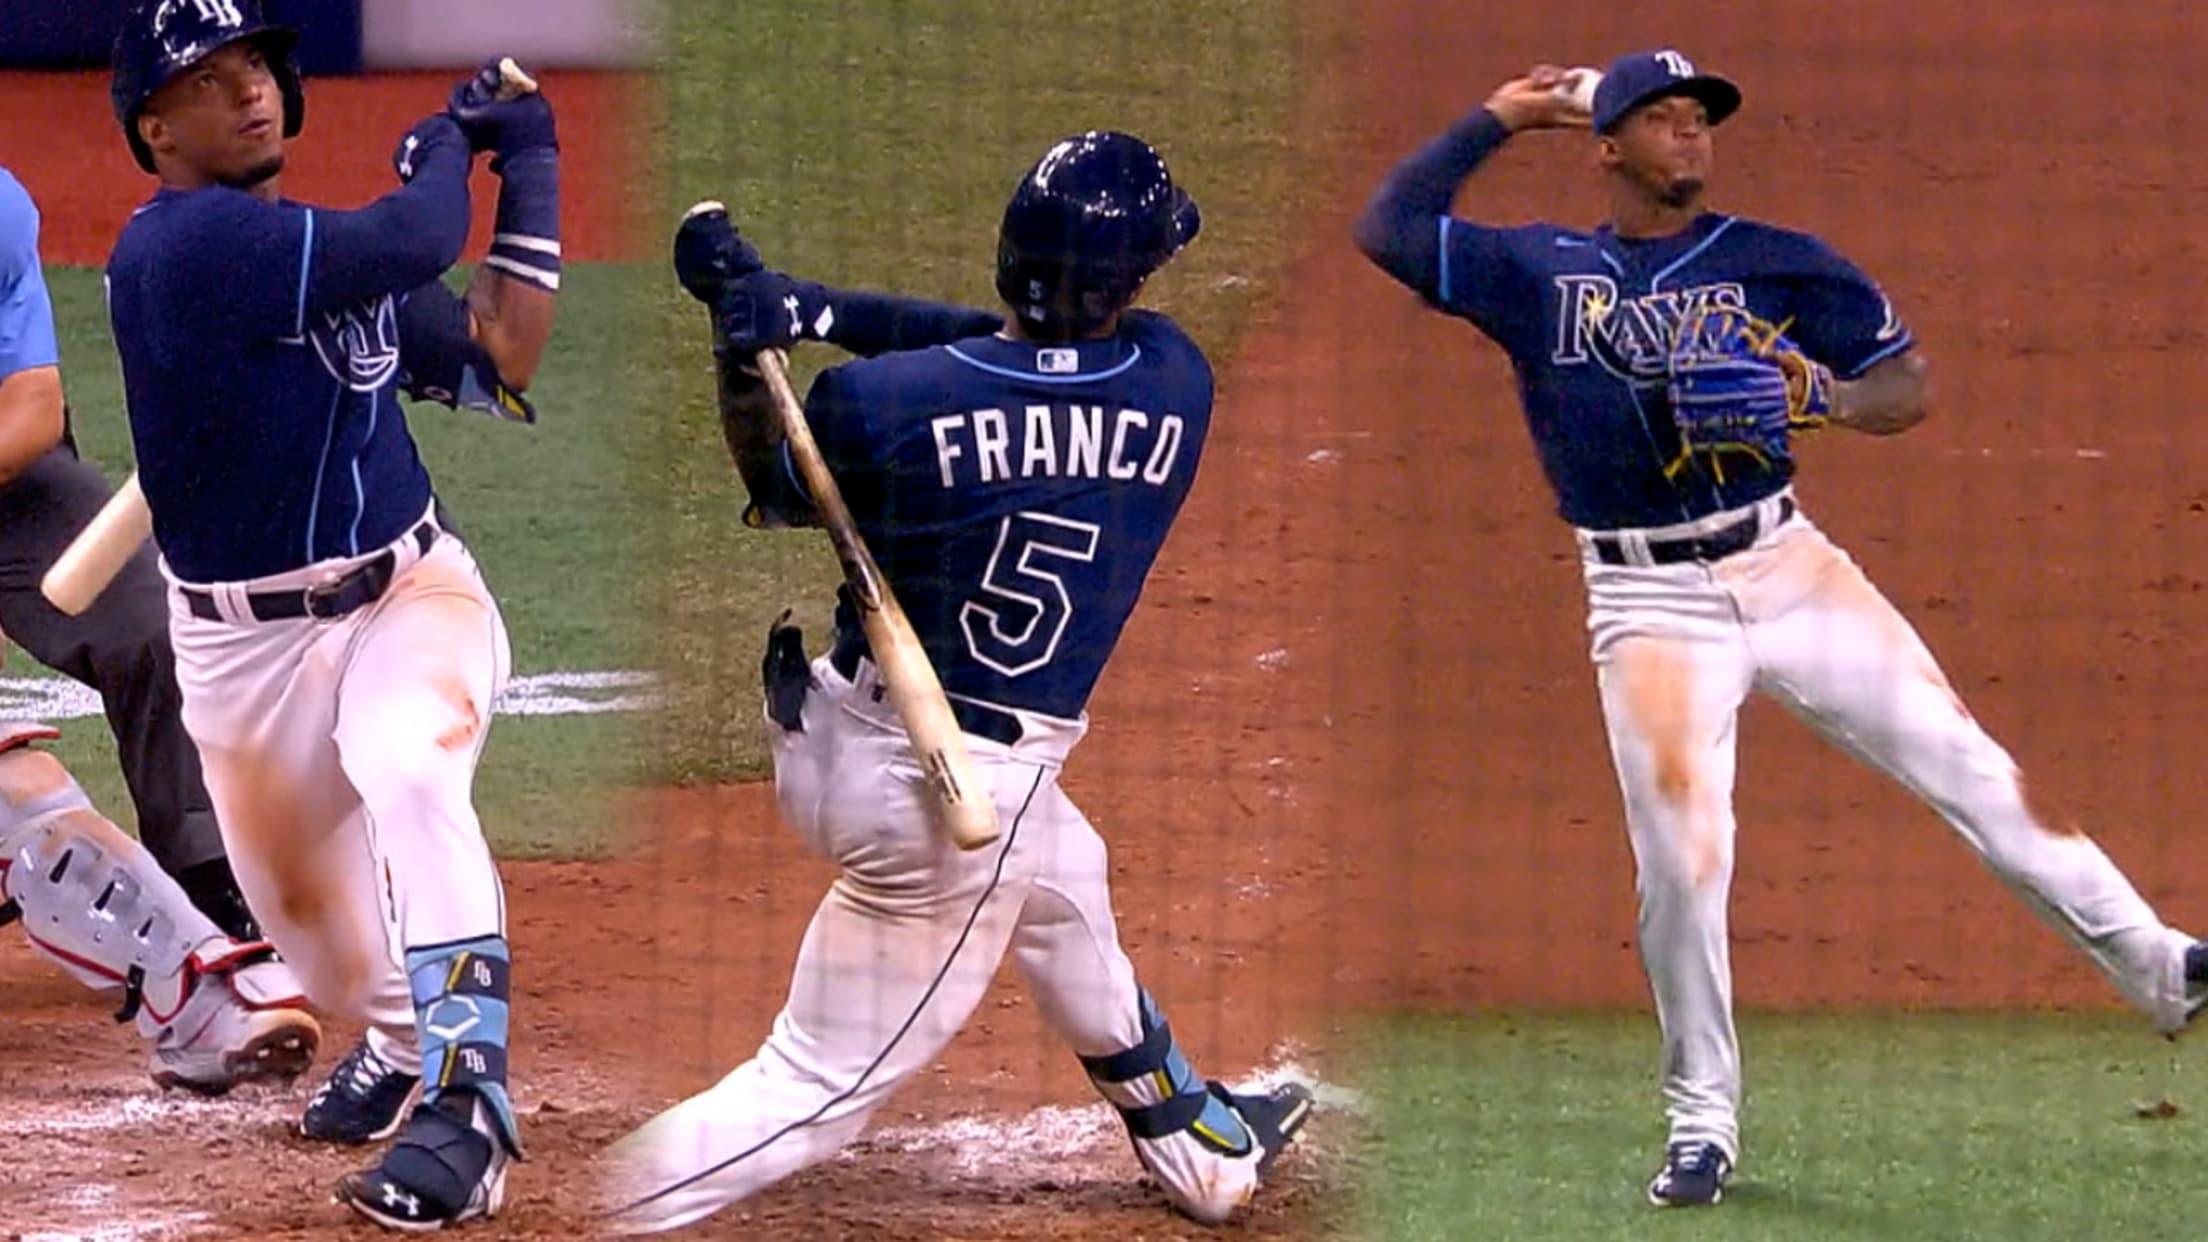 Wander Franco's stellar MLB debut